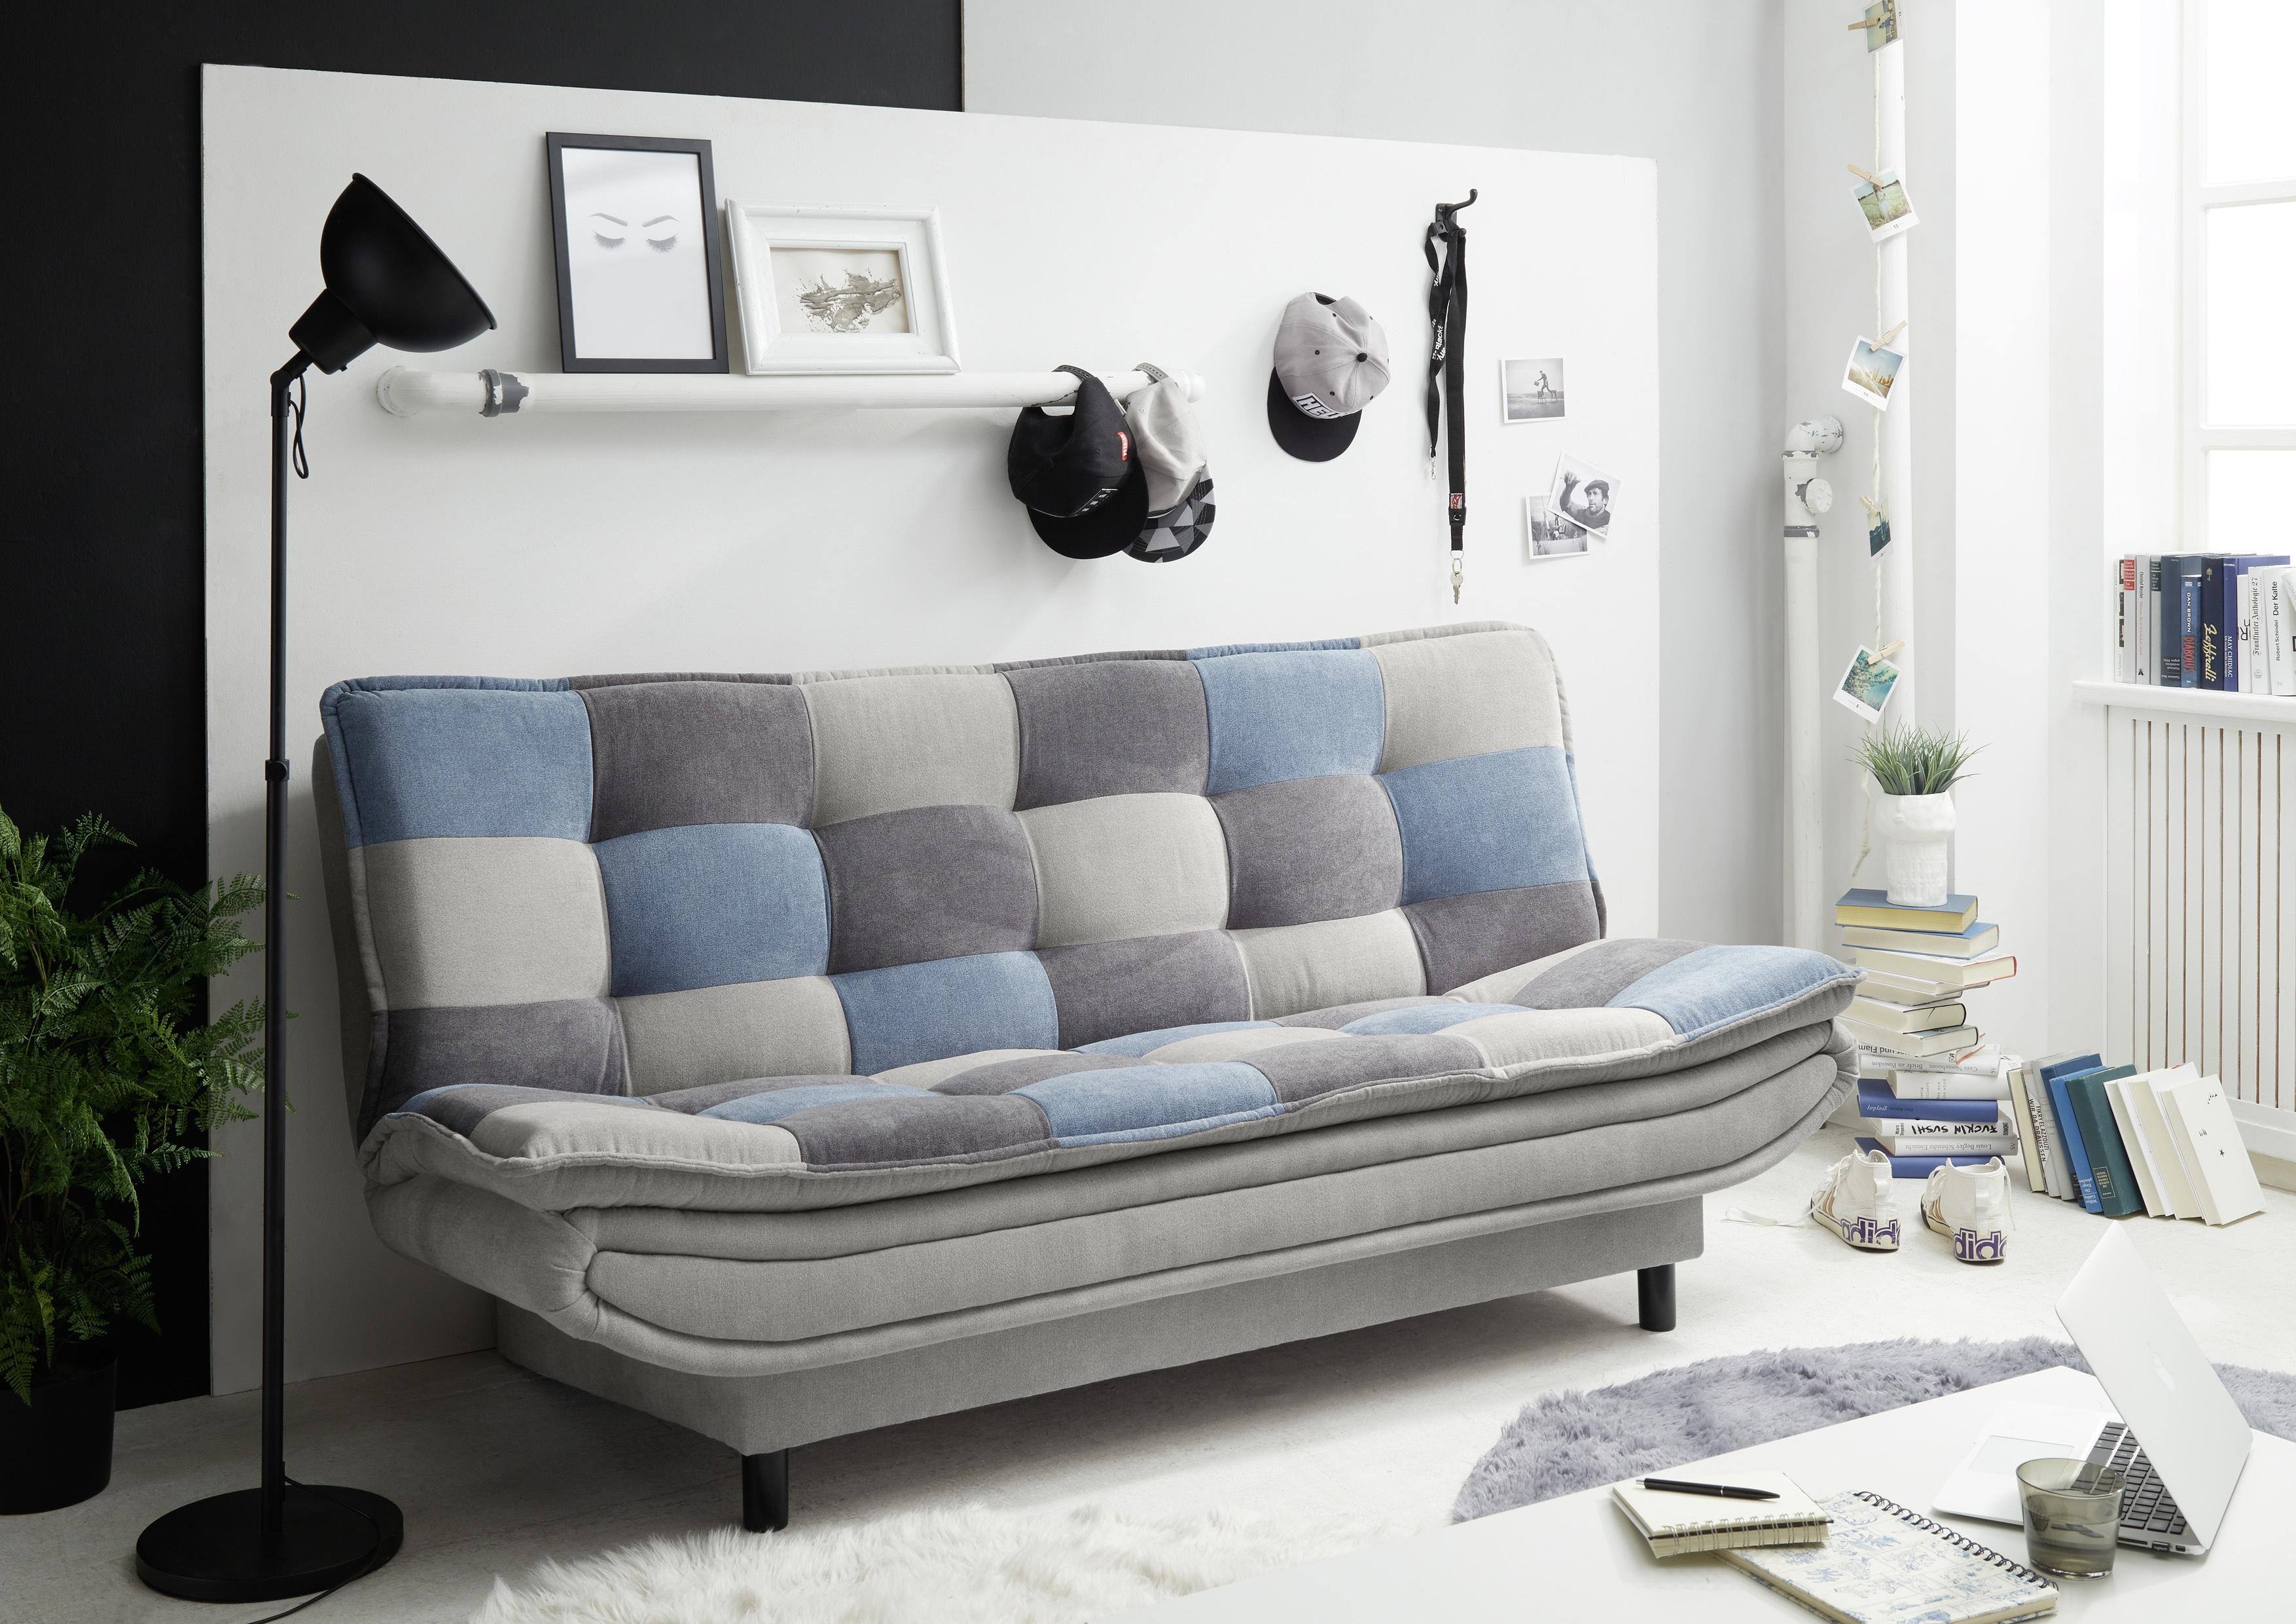 Canapea extensibila tapitata cu stofa, 3 locuri Patris Patch Gri / Albastru, l188xA89xH90 cm poza